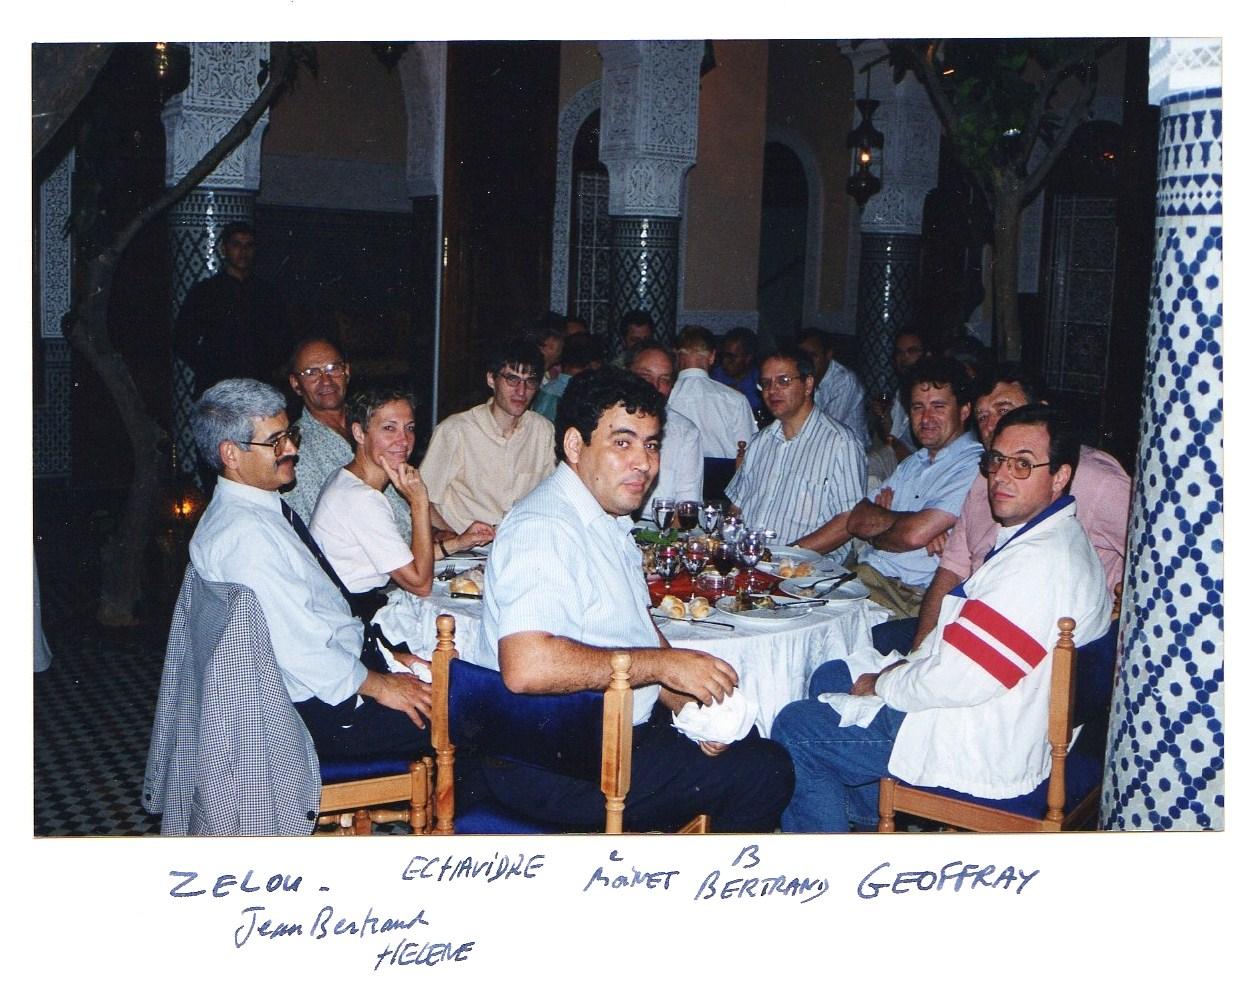 casa-lyonnaise-1997-bertrand-moinet.jpg